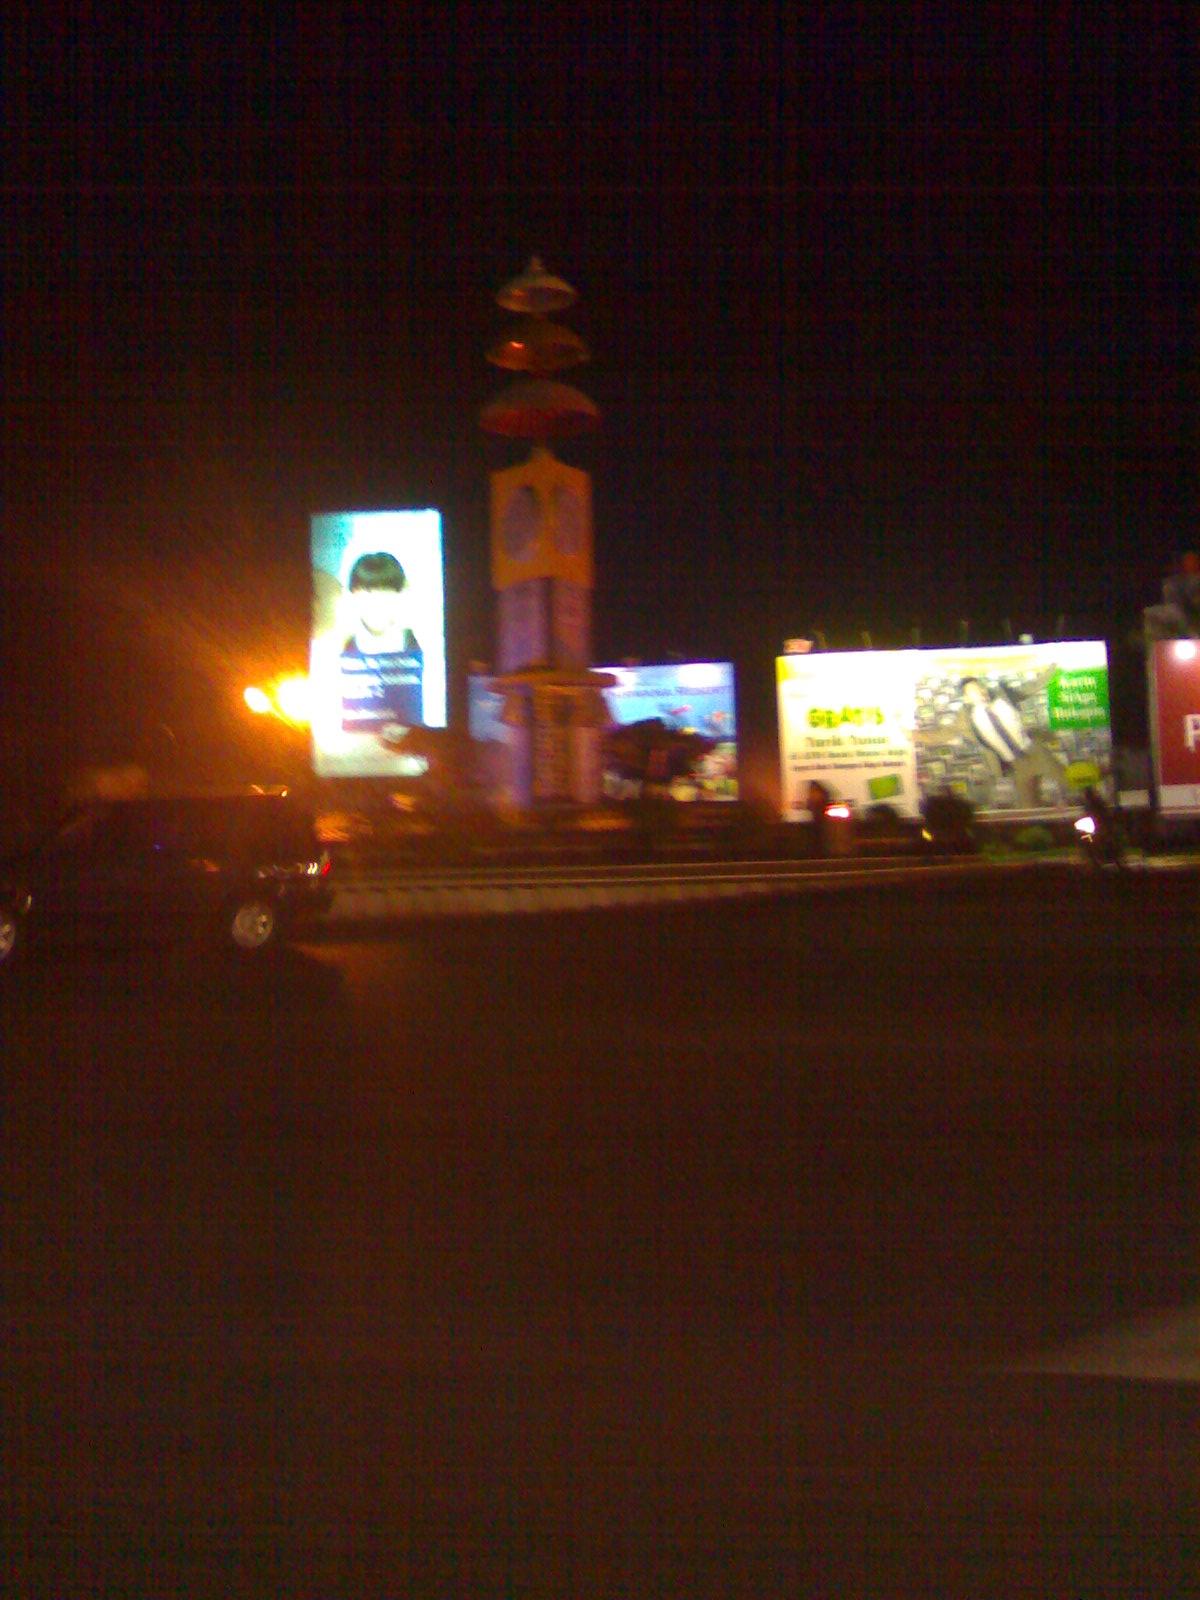 Galery Foto Cappuccino Break Tugu Pusat Kota Bandar Lampung Adipura